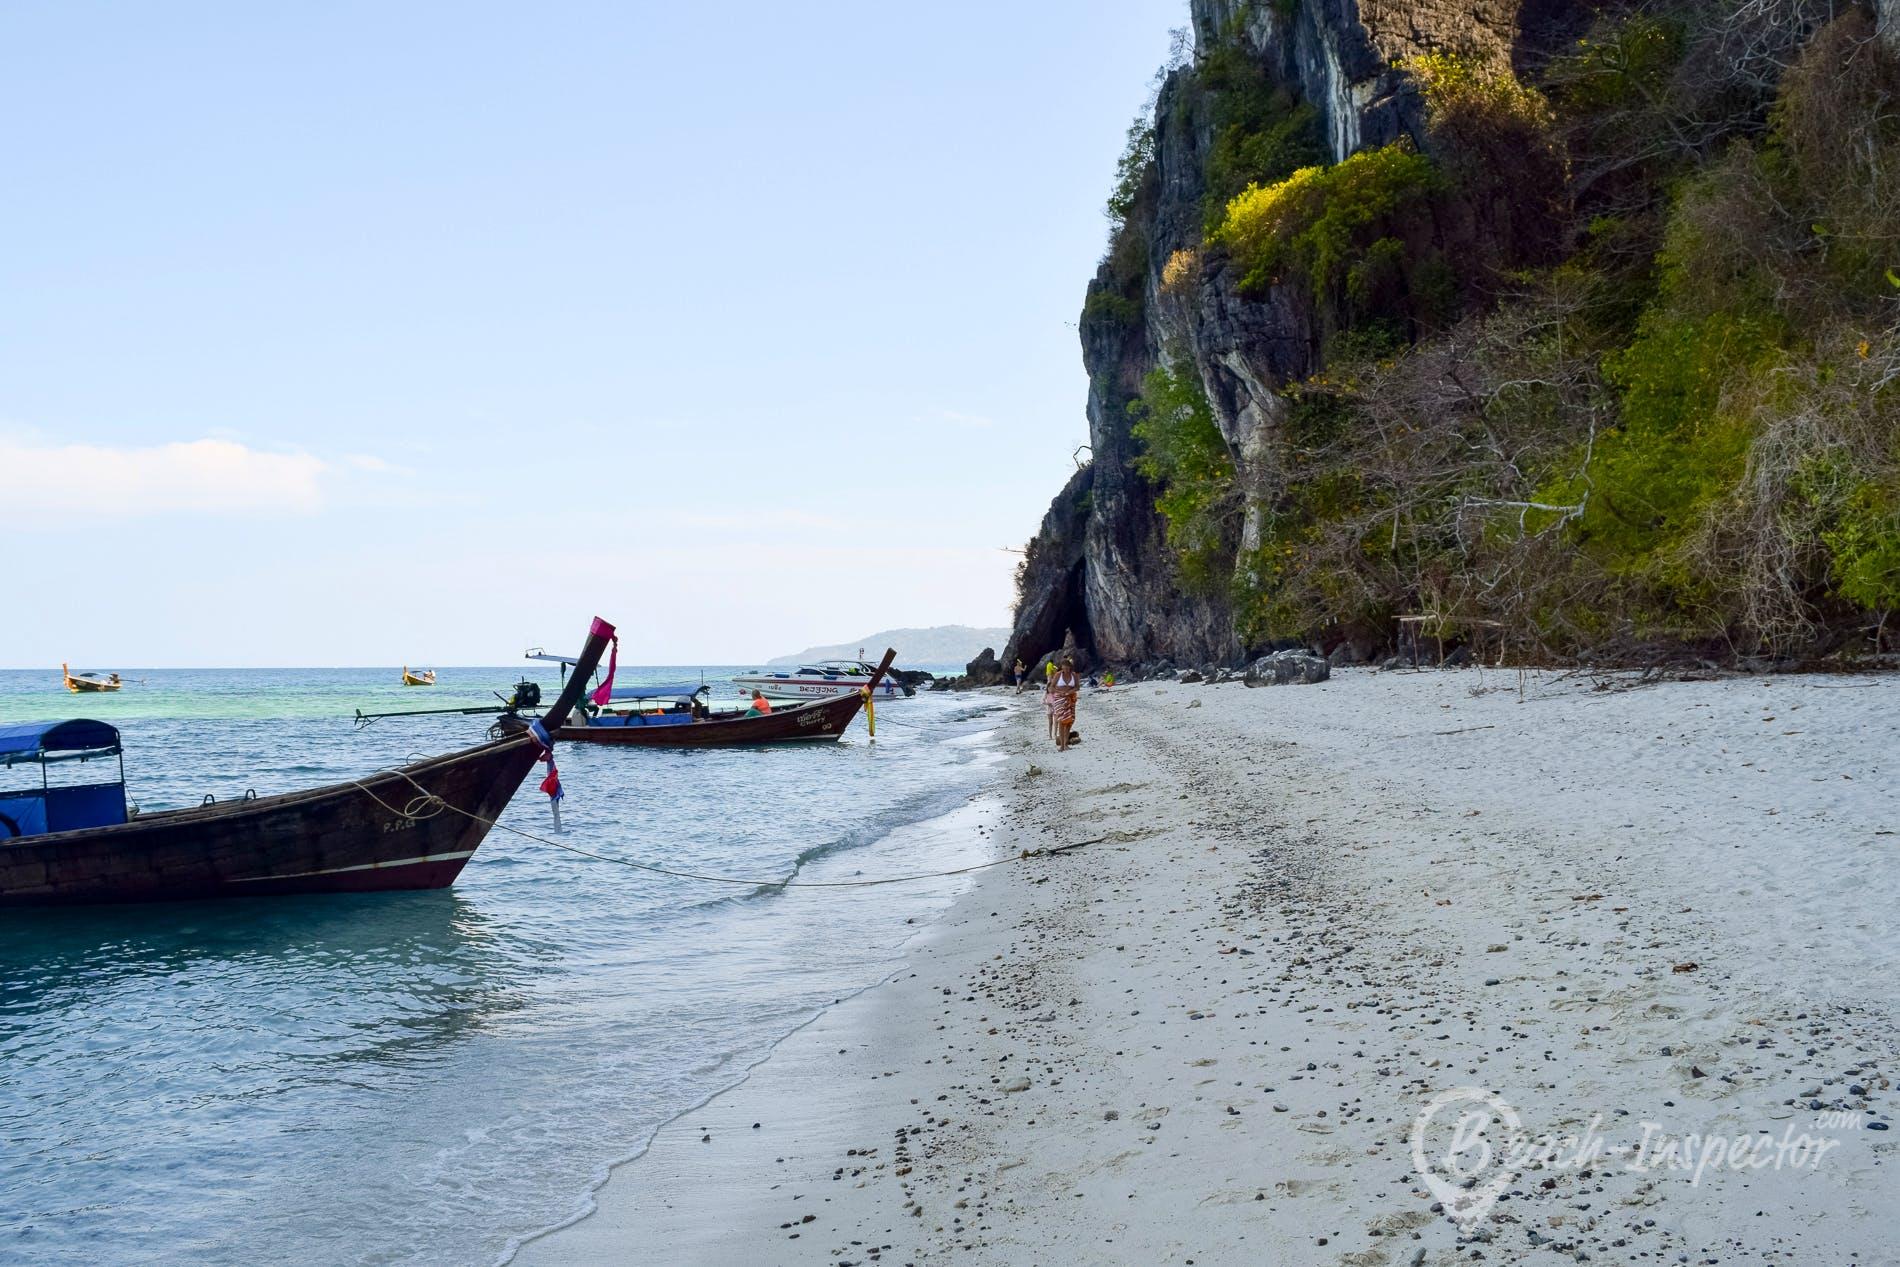 Beach Mosquito Island, Koh Phi Phi, Thailand